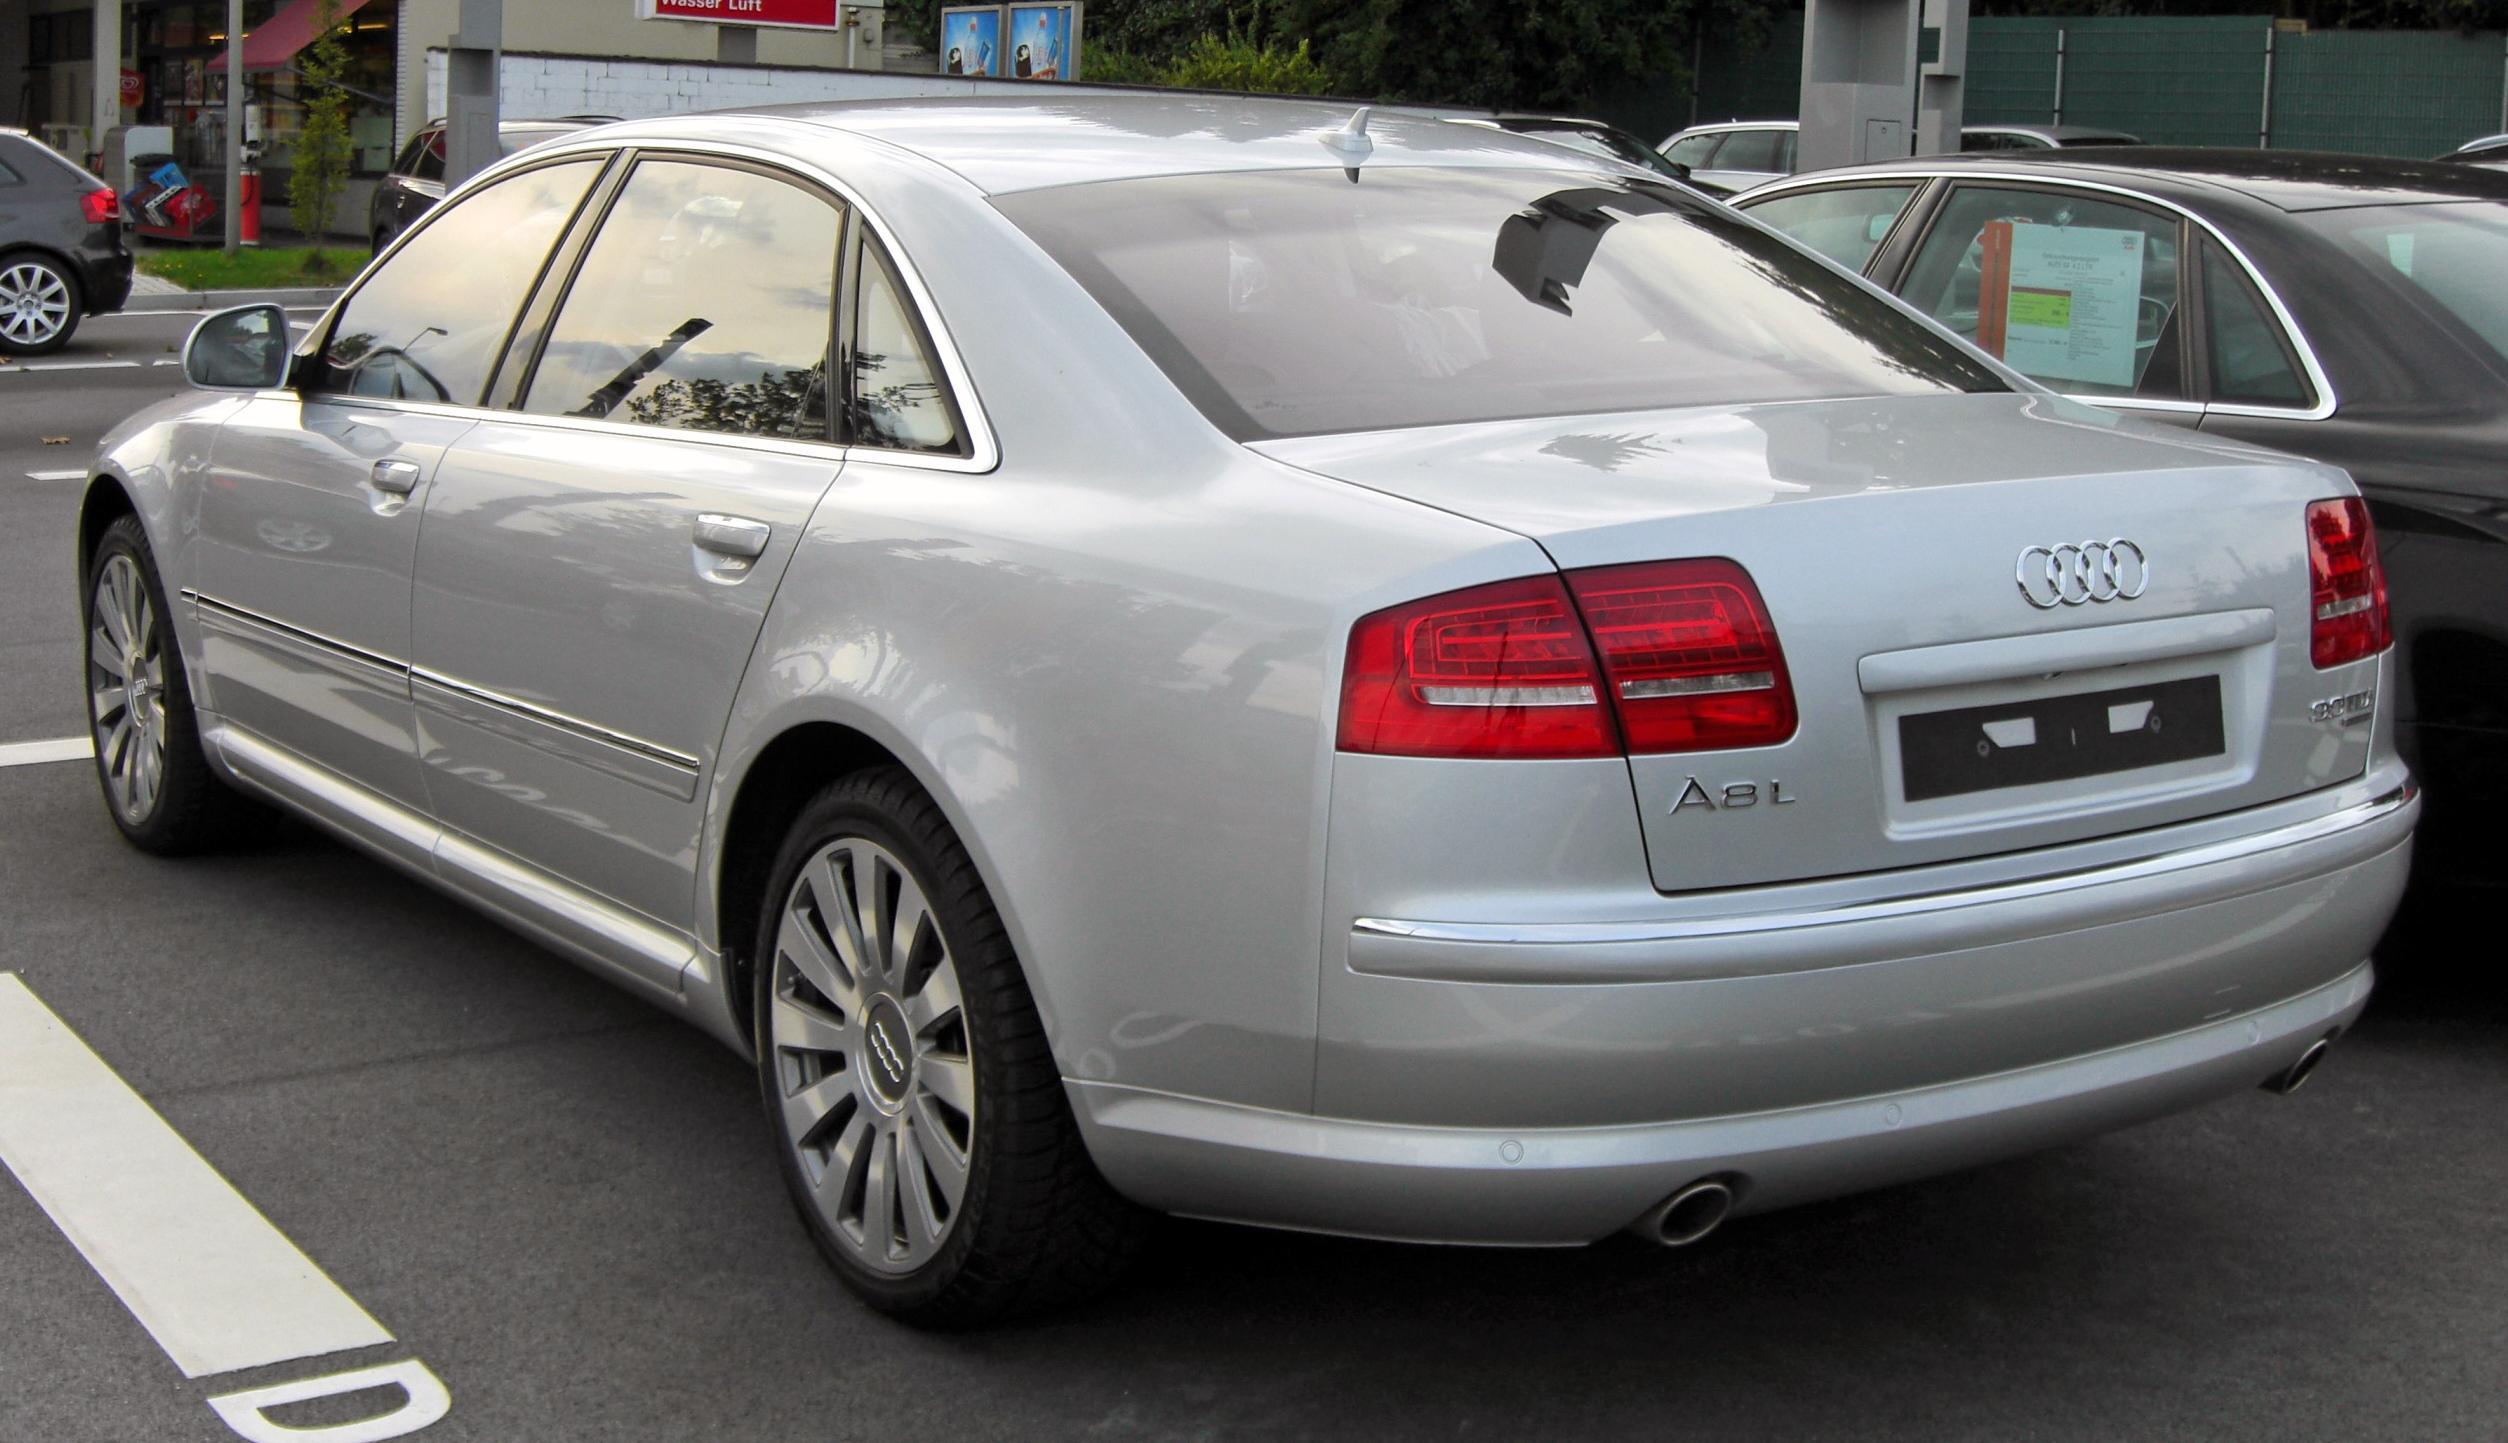 Kelebihan Kekurangan Audi A8 2009 Murah Berkualitas